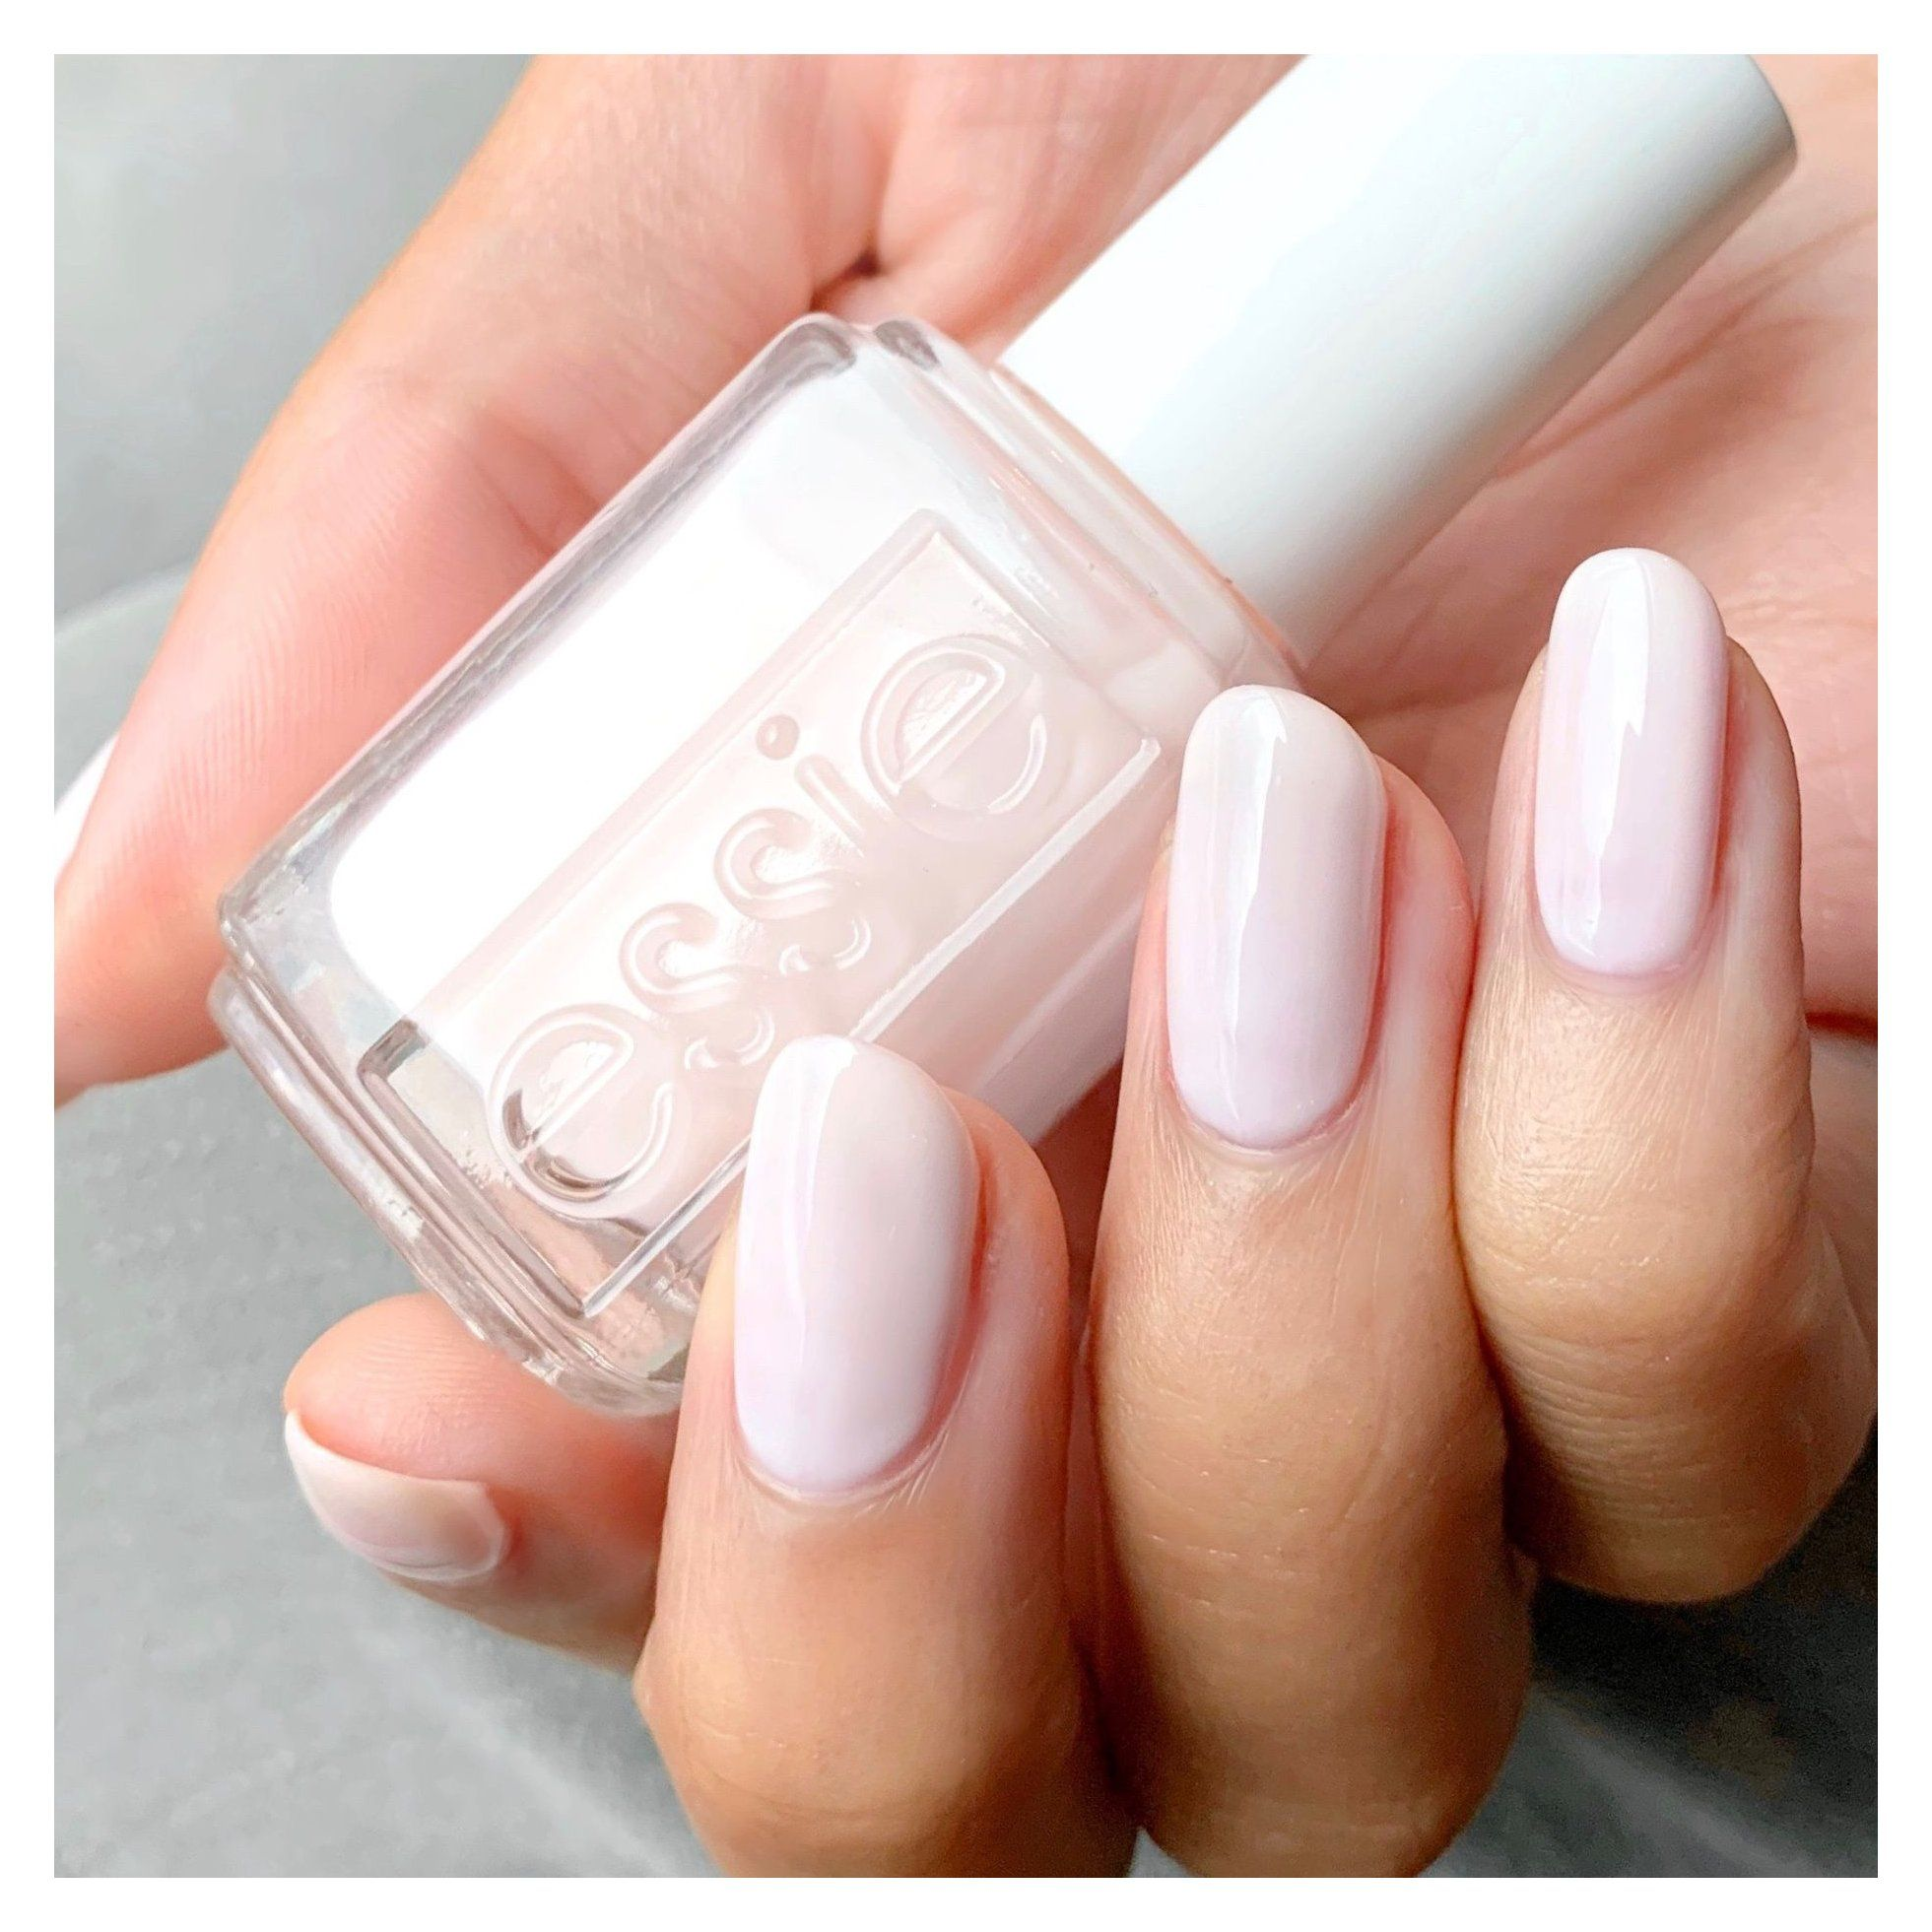 Ballet Slippers Enamel Essie Essie Ballet Slippers Nail Polish Balletslippersnailpolish Essie Ballet Slippe Pale Pink Nails Pale Nails Pink Nail Colors